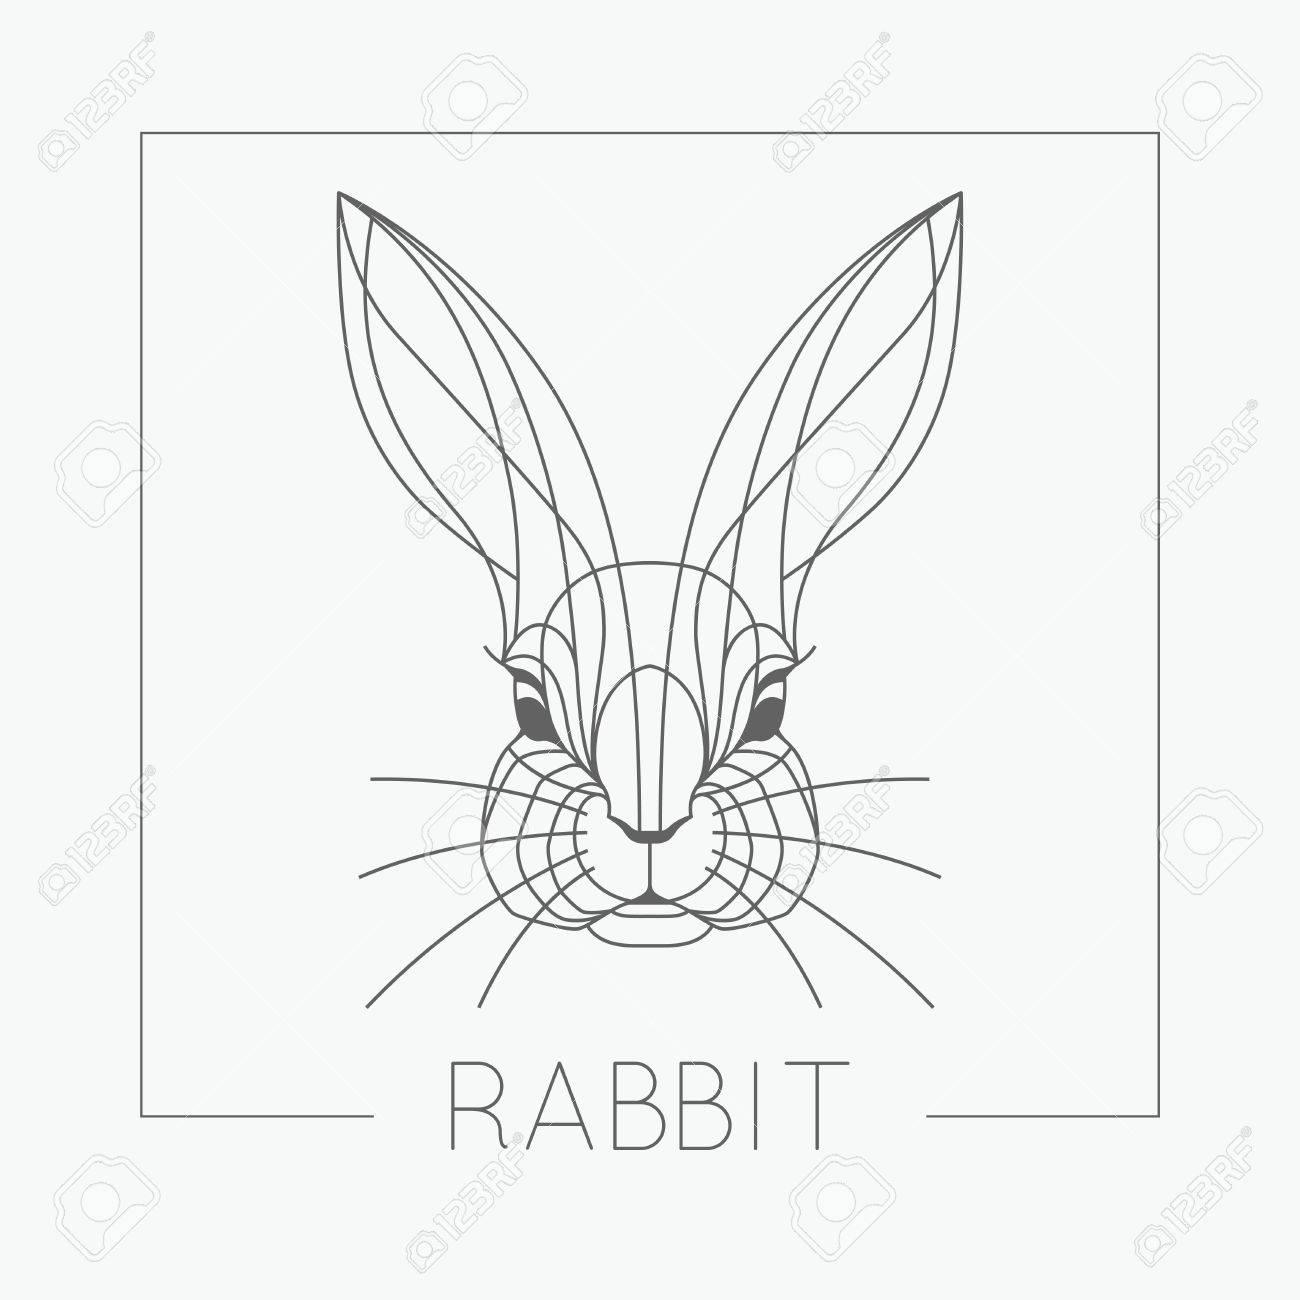 1300x1300 Abstract Rabbit Bunny Head Emblem Icon Design With Elegant Line